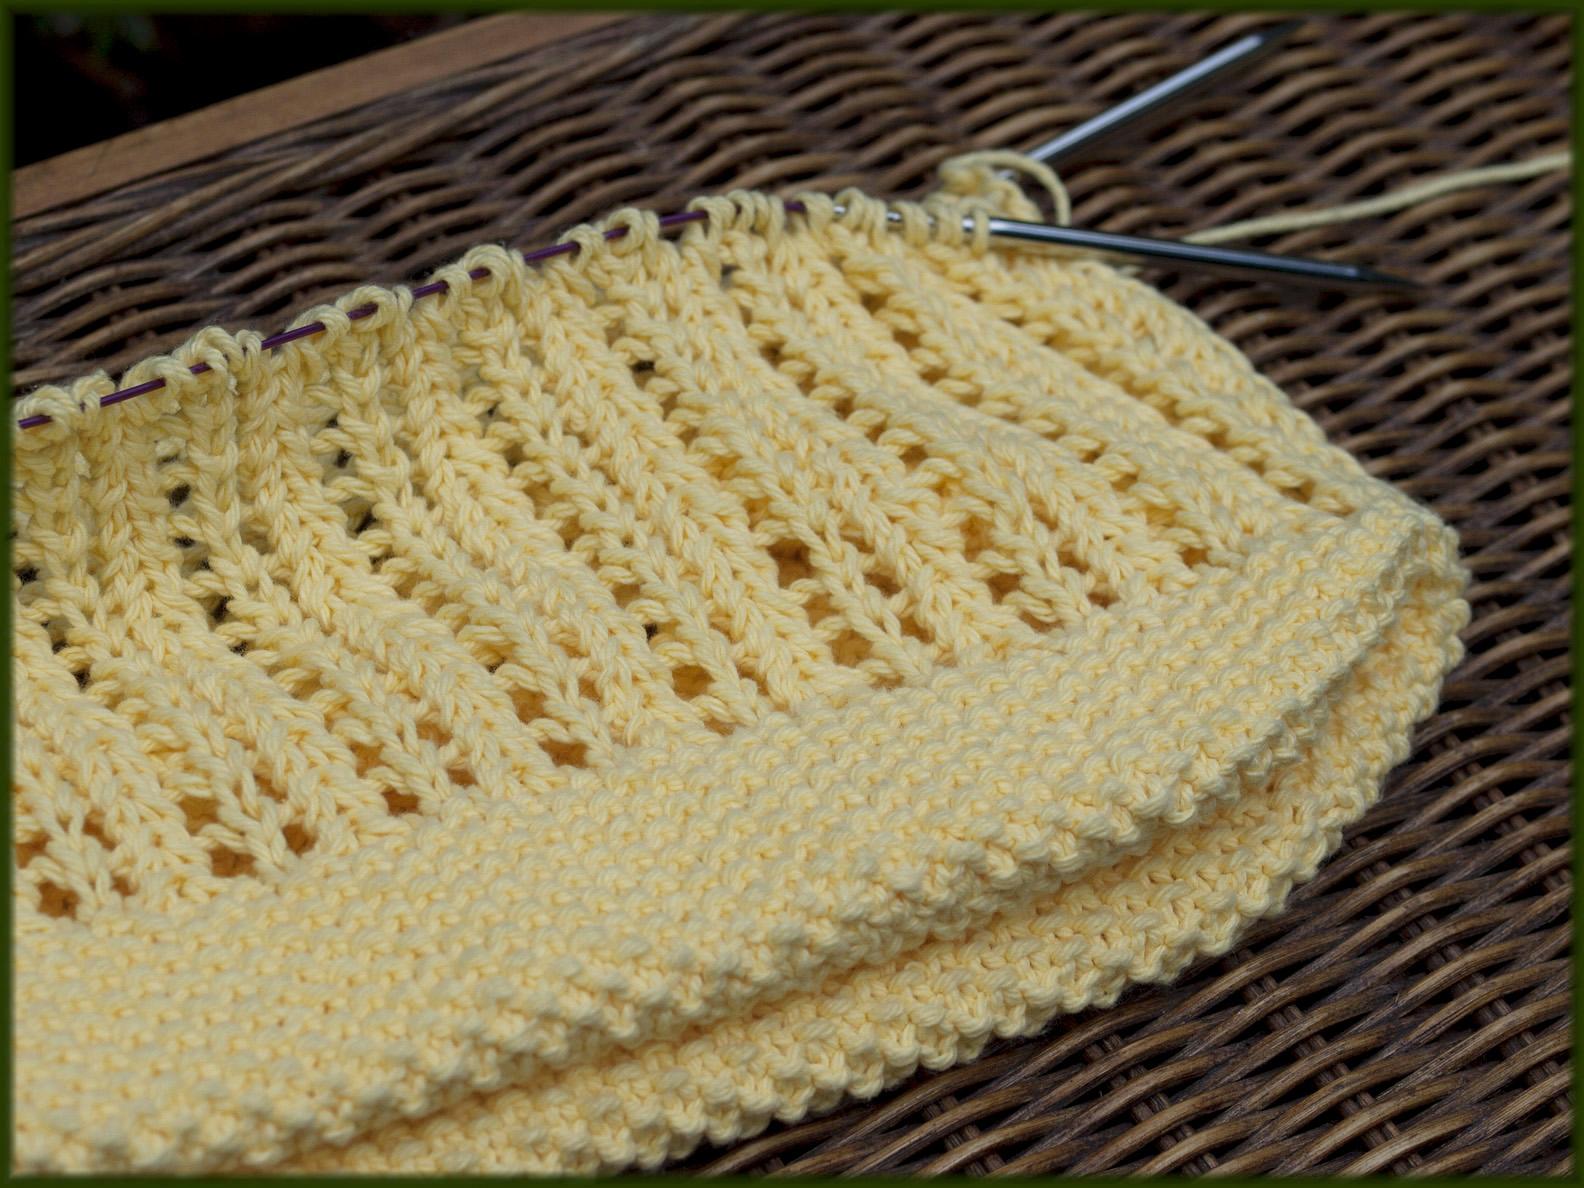 Wyndlestraw Designs: Market Bag Knit-along #5 - Picking up stitches